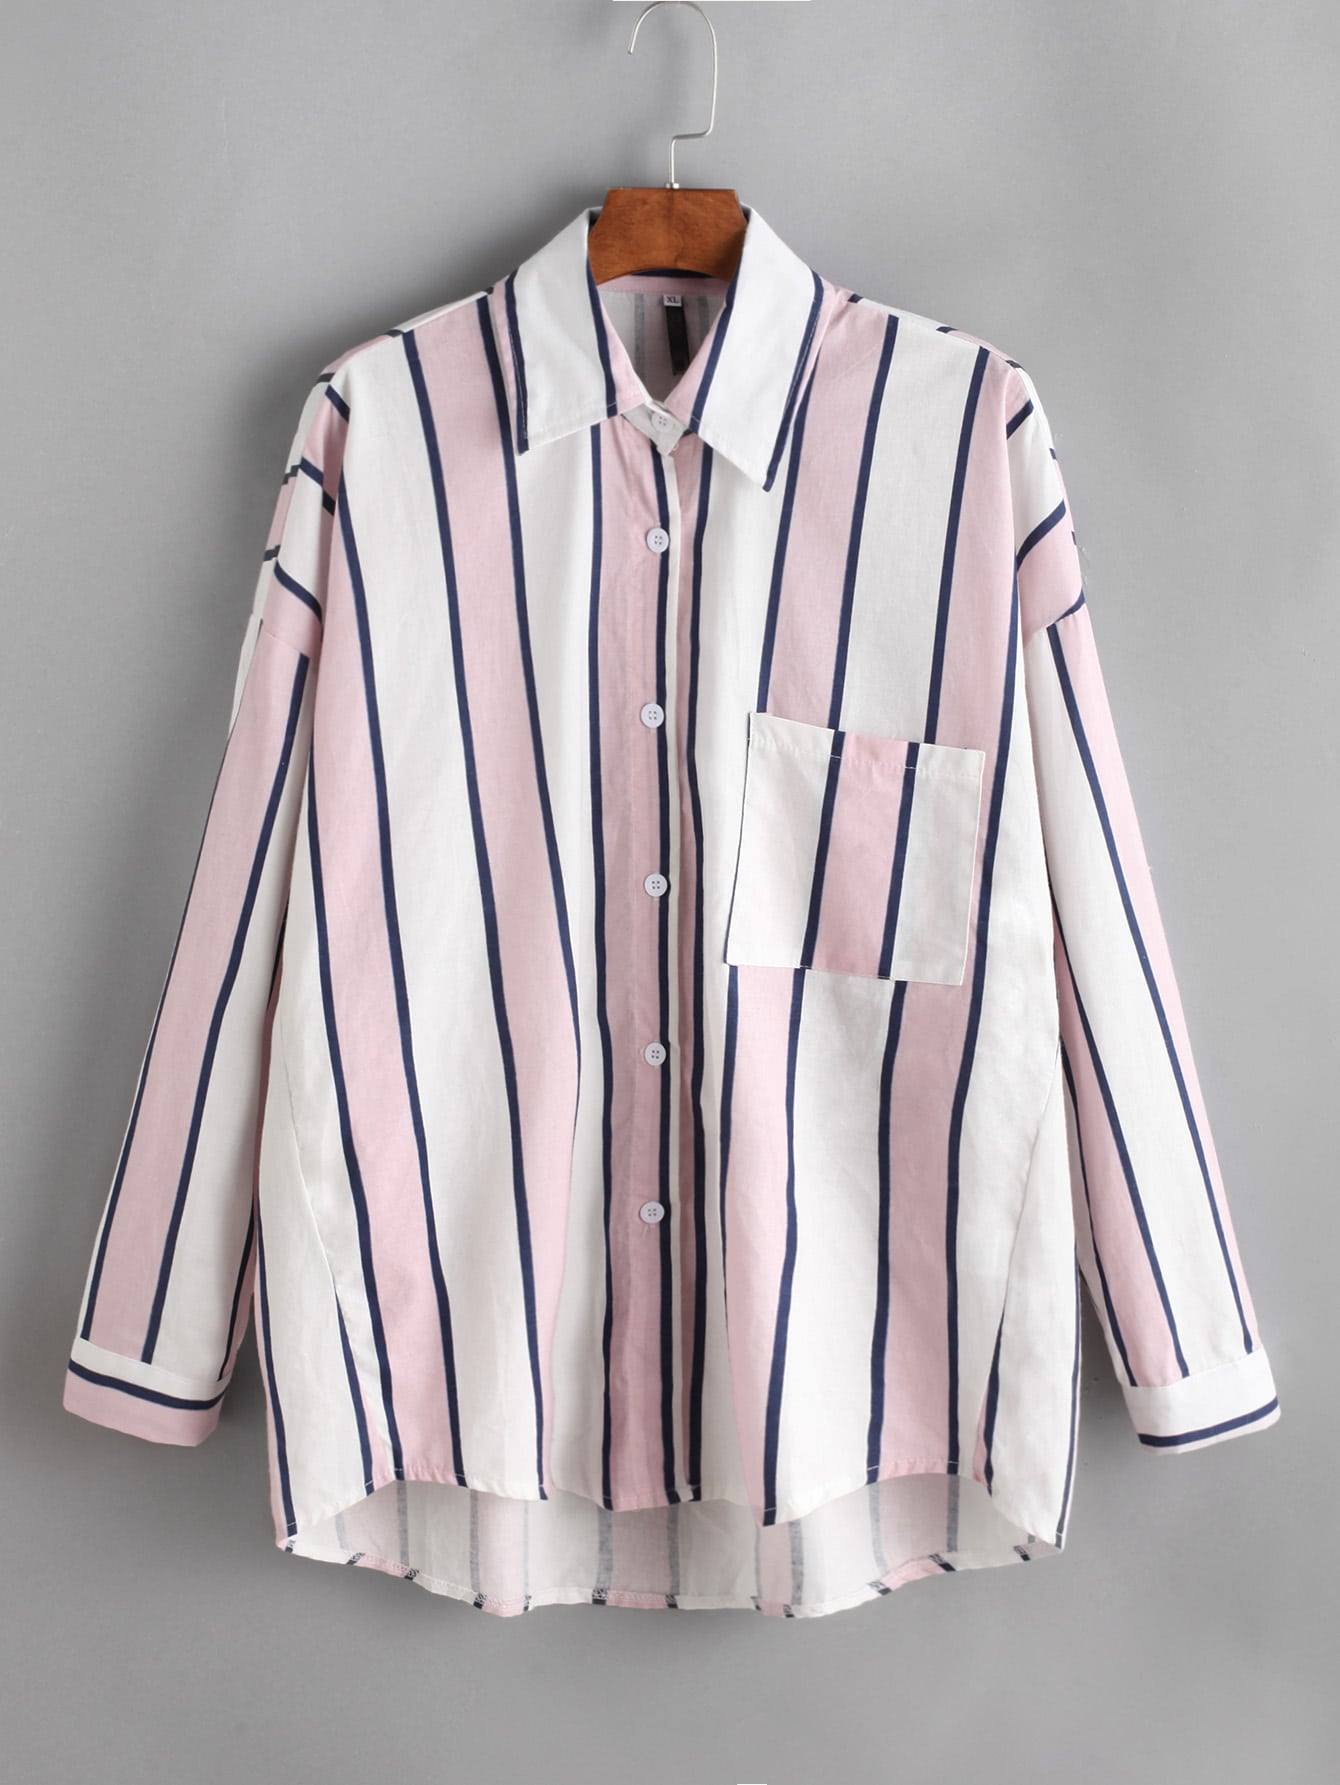 blouse161115105_2